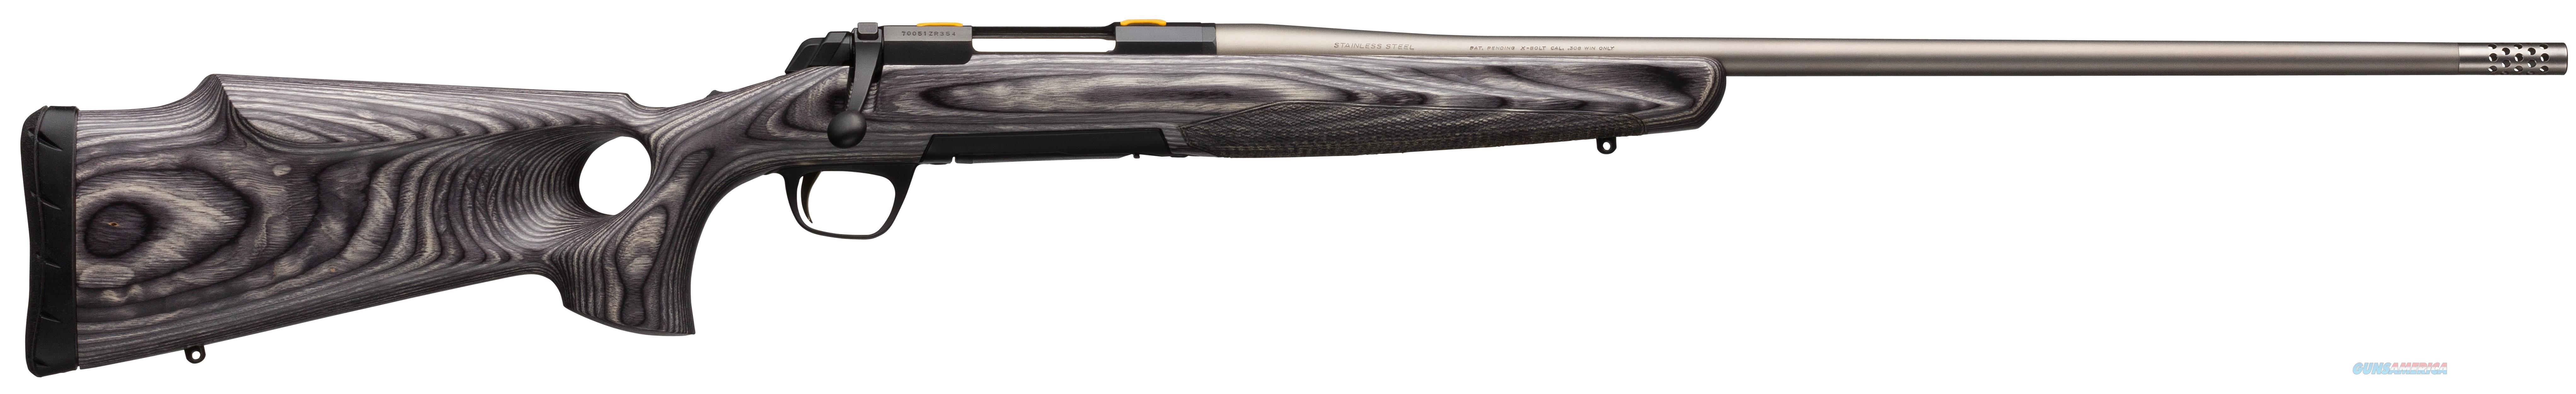 "Browning X-Bolt Eclipse Hunter .270 WSM 24"" 035439248   Guns > Rifles > Browning Rifles > Bolt Action > Hunting > Stainless"